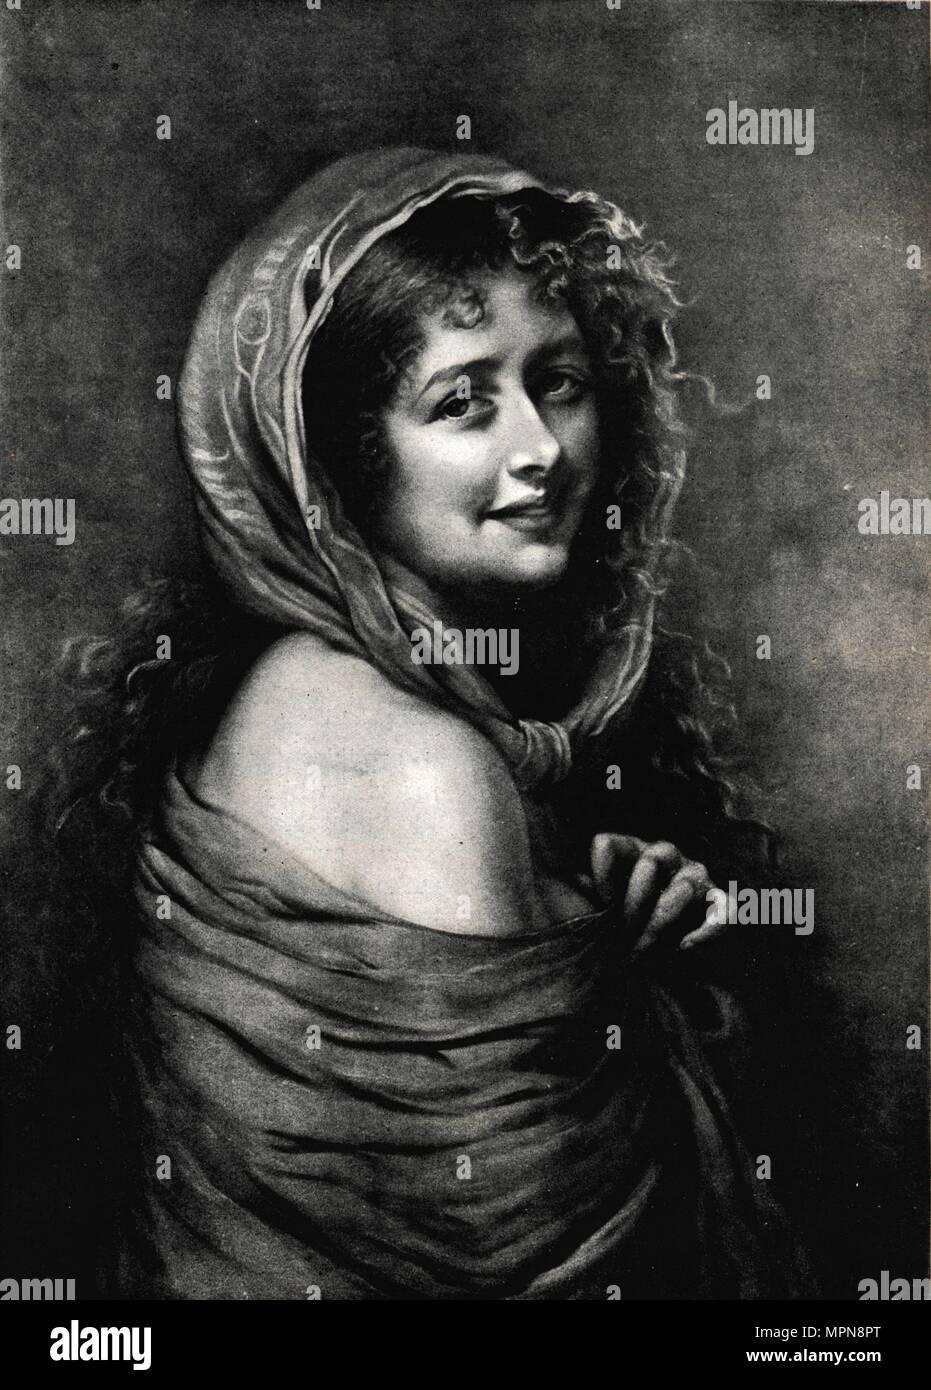 'Kathleen Mavourneen', c1850, (1911). Artist: Charles Marshall. - Stock Image